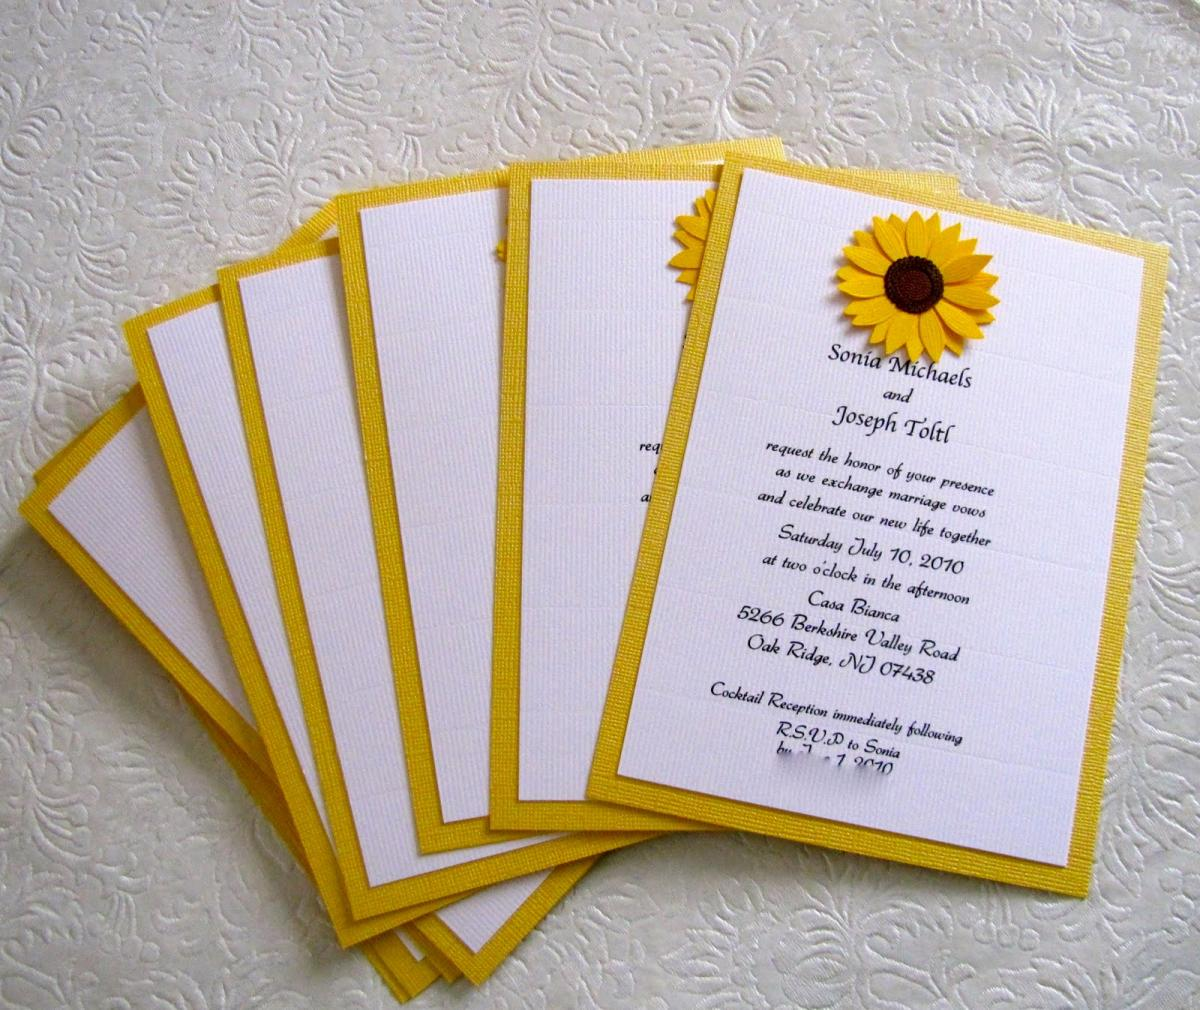 diy blue and yellow wedding invitations yellow wedding invitations Blue And Yellow Wedding Invitation Templates Inspiring